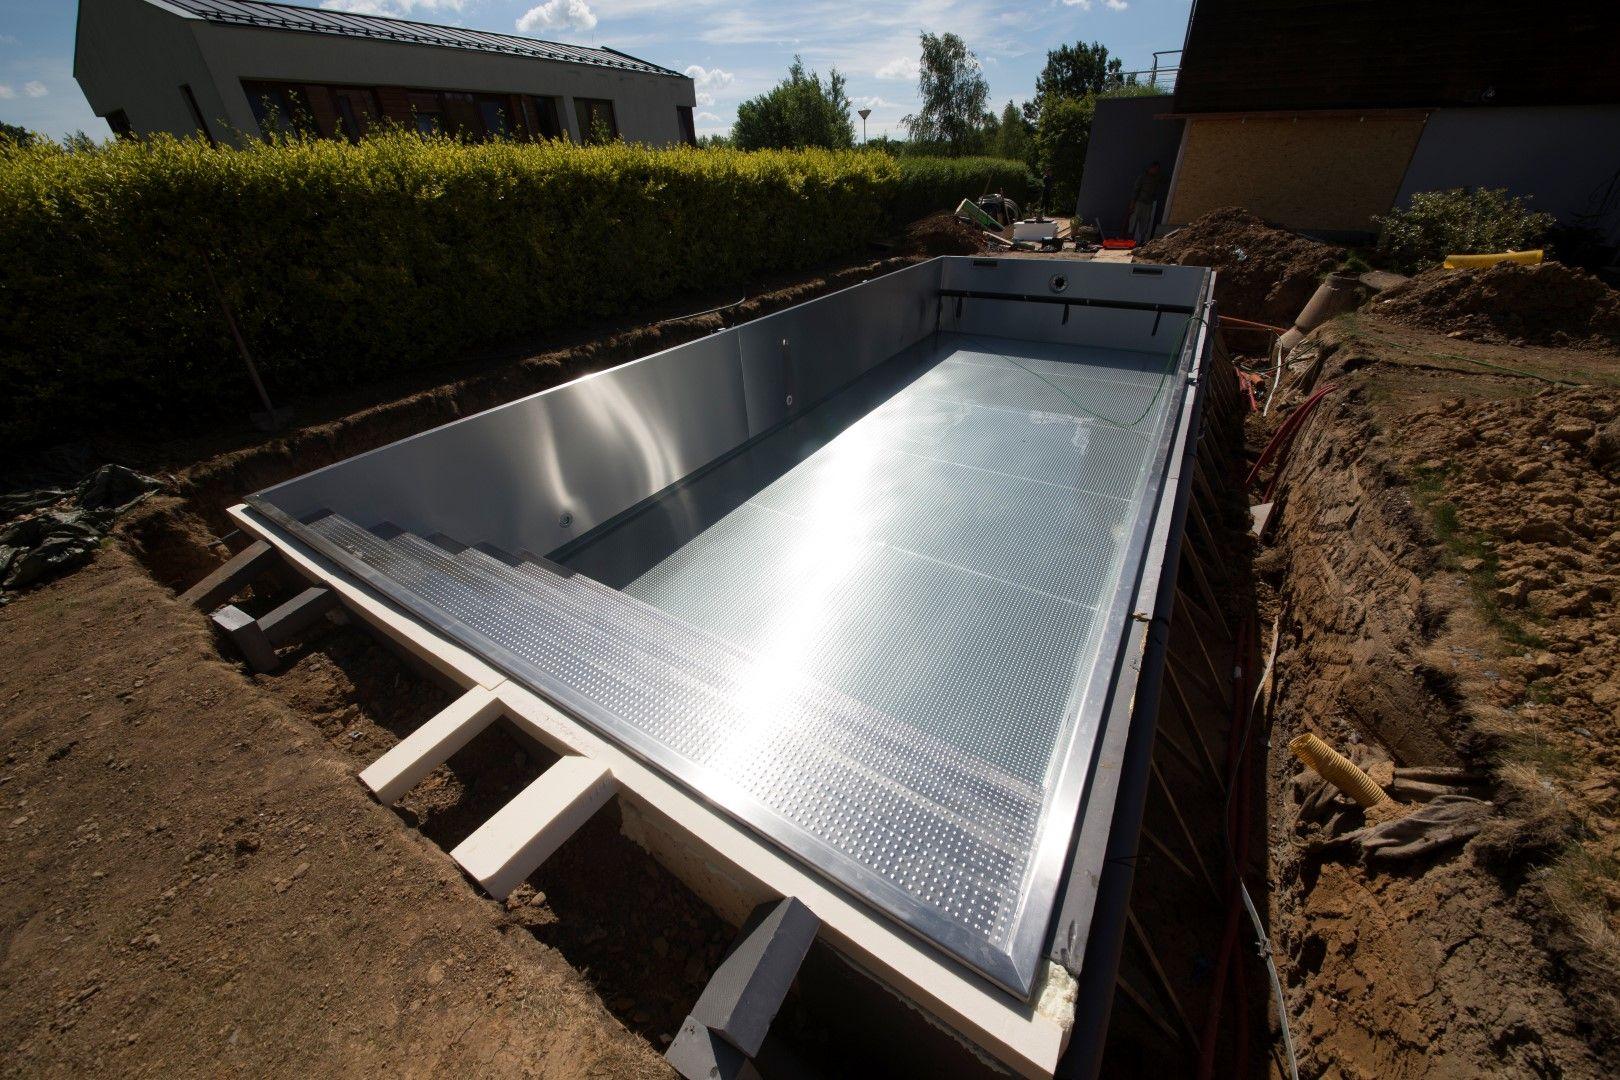 Piscine En Inox Steel And Style installation of stainless steel pool imaginox | piscine inox